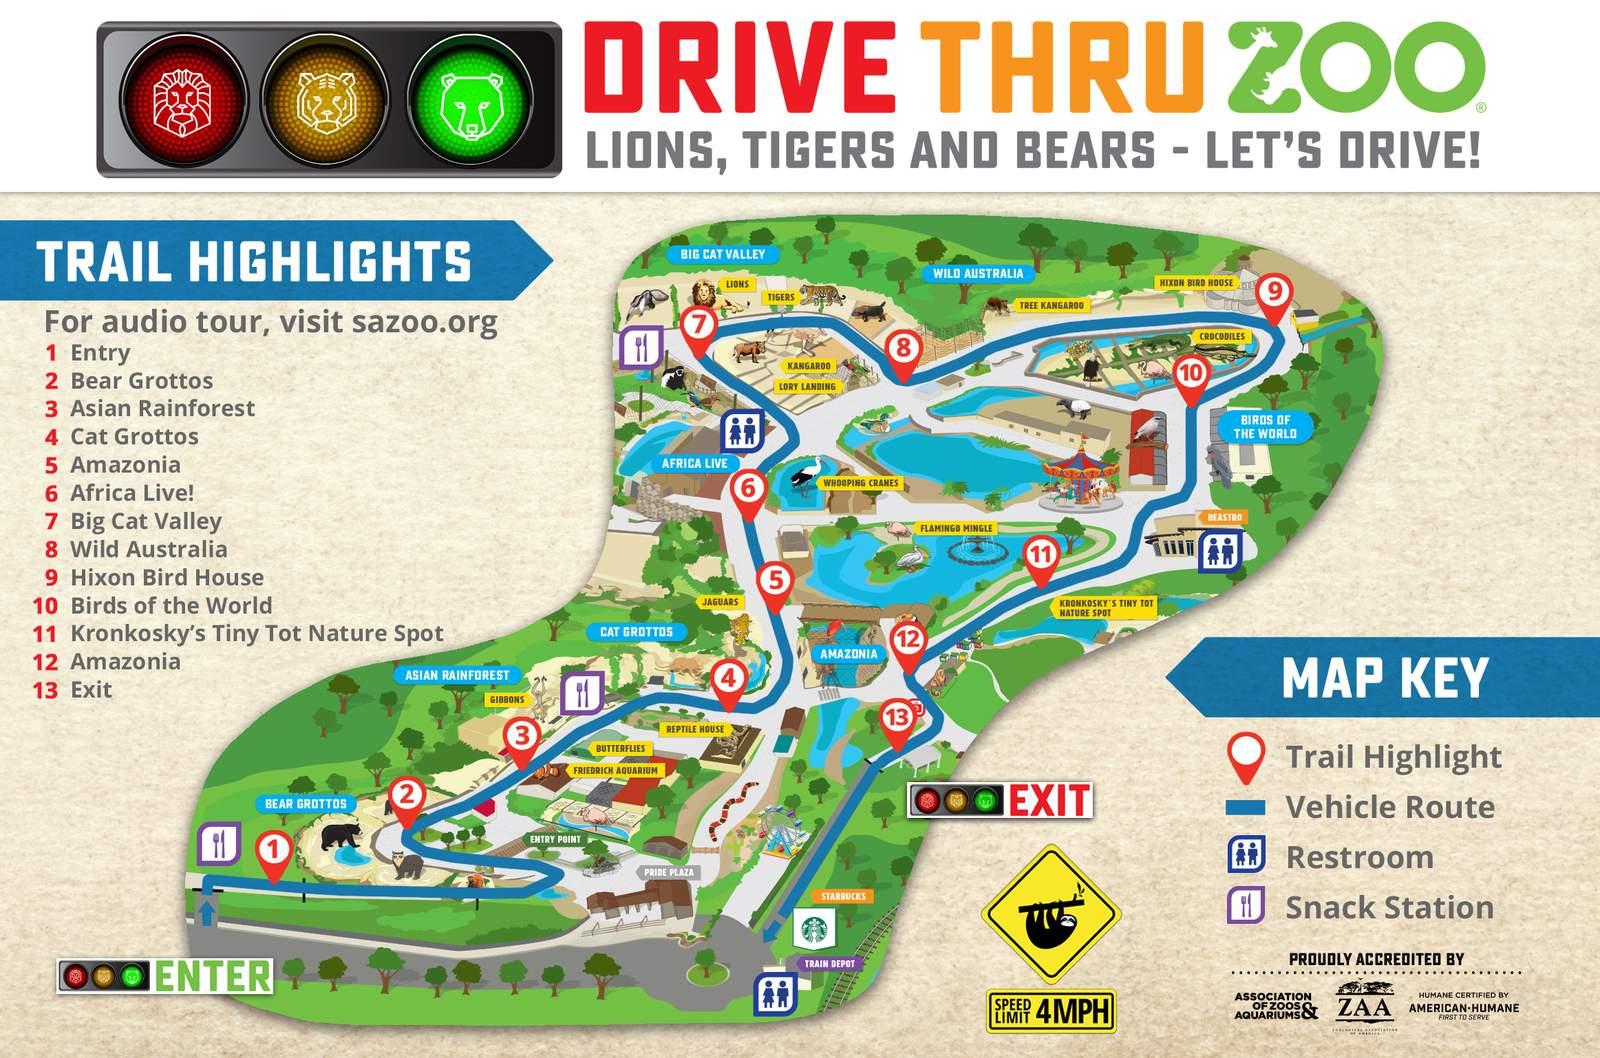 San Antonio Drive-Thru Zoo